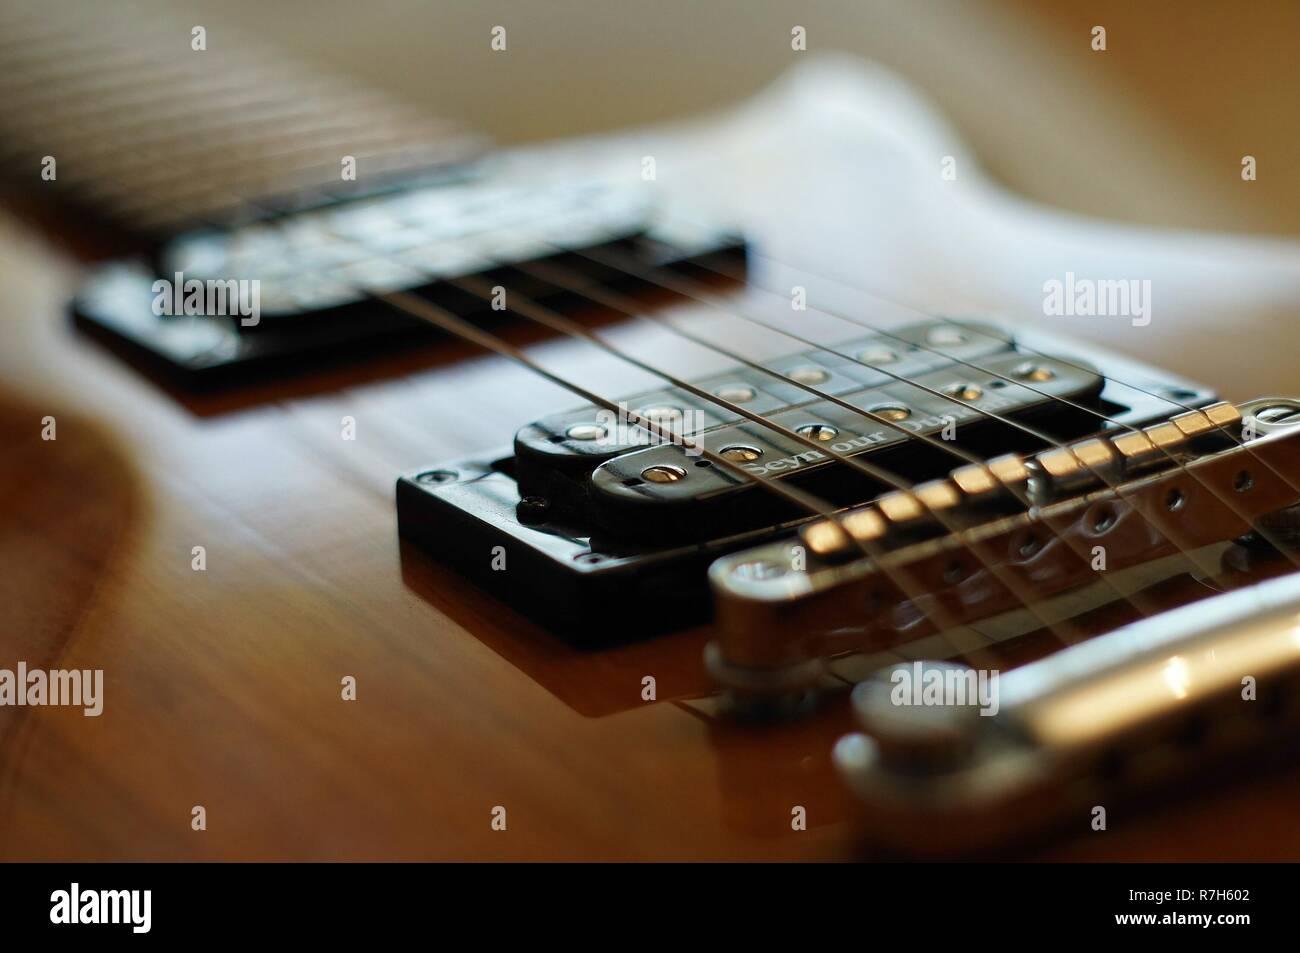 Streams and Bridges. Closeup shot of Washburn Idol WI-64 electric guitar with Tune-o-matic bridge. - Stock Image